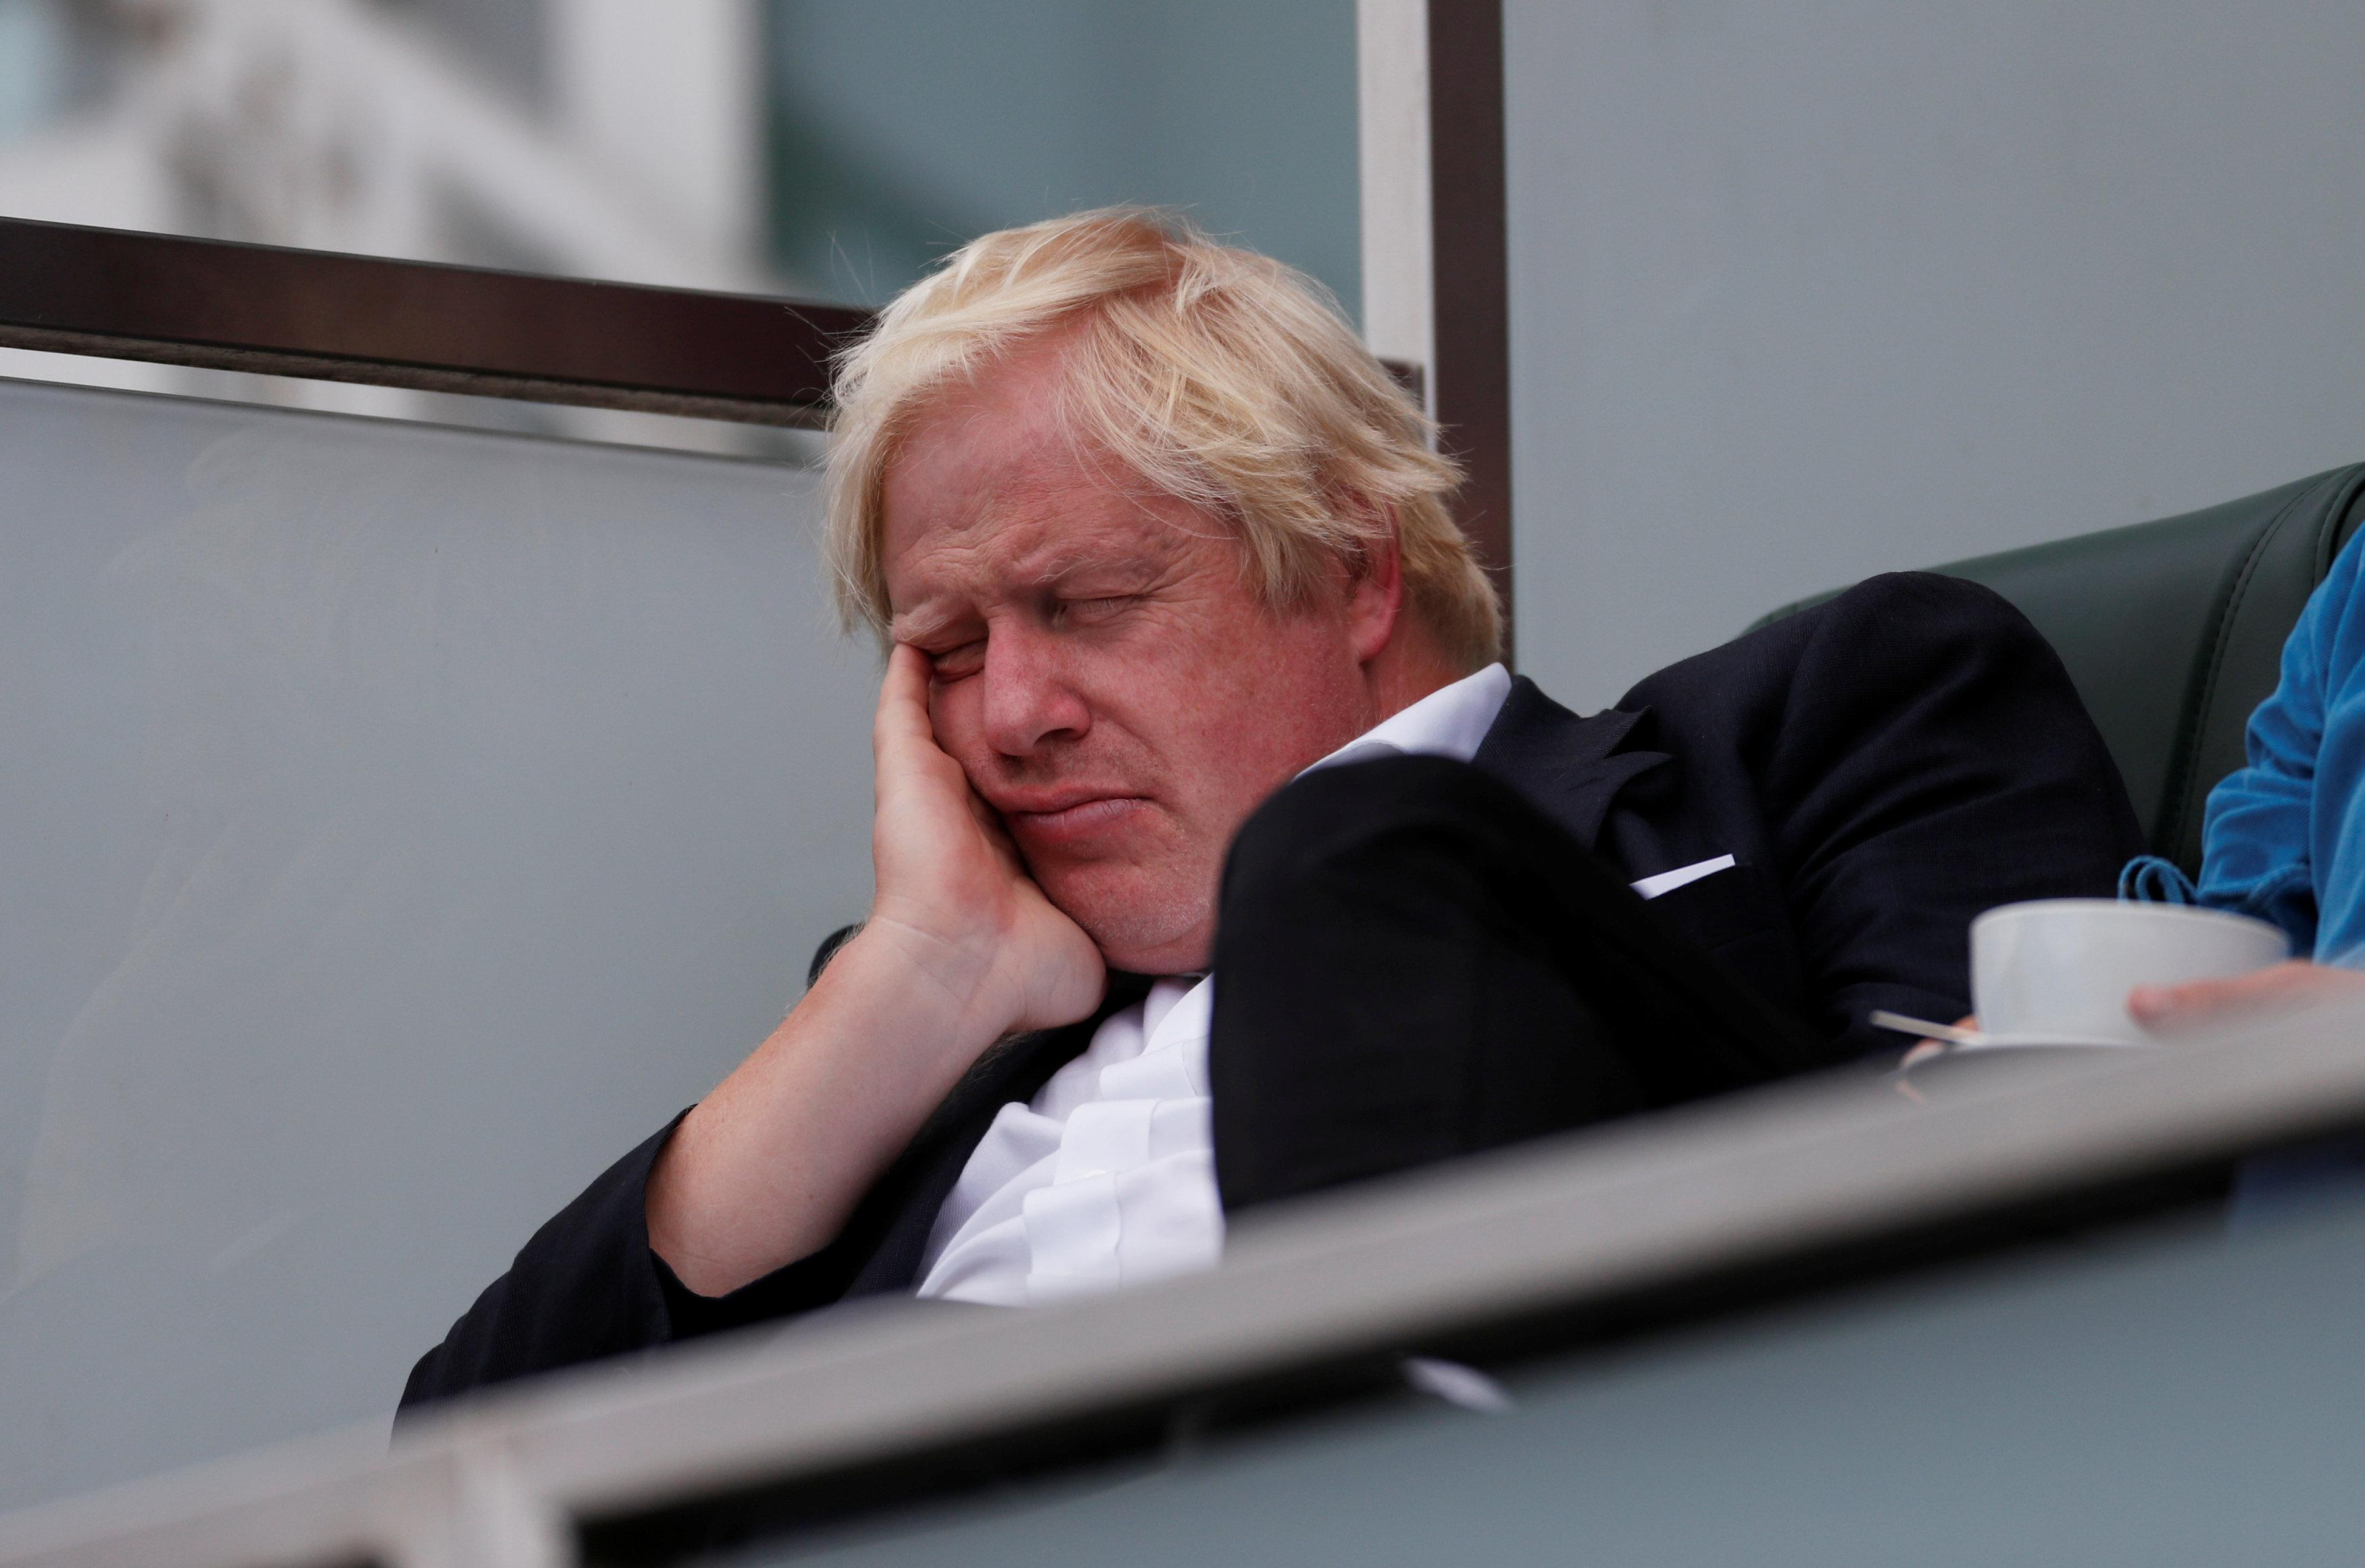 Boris Johnson falls asleep during England vs India cricket match after stressful week